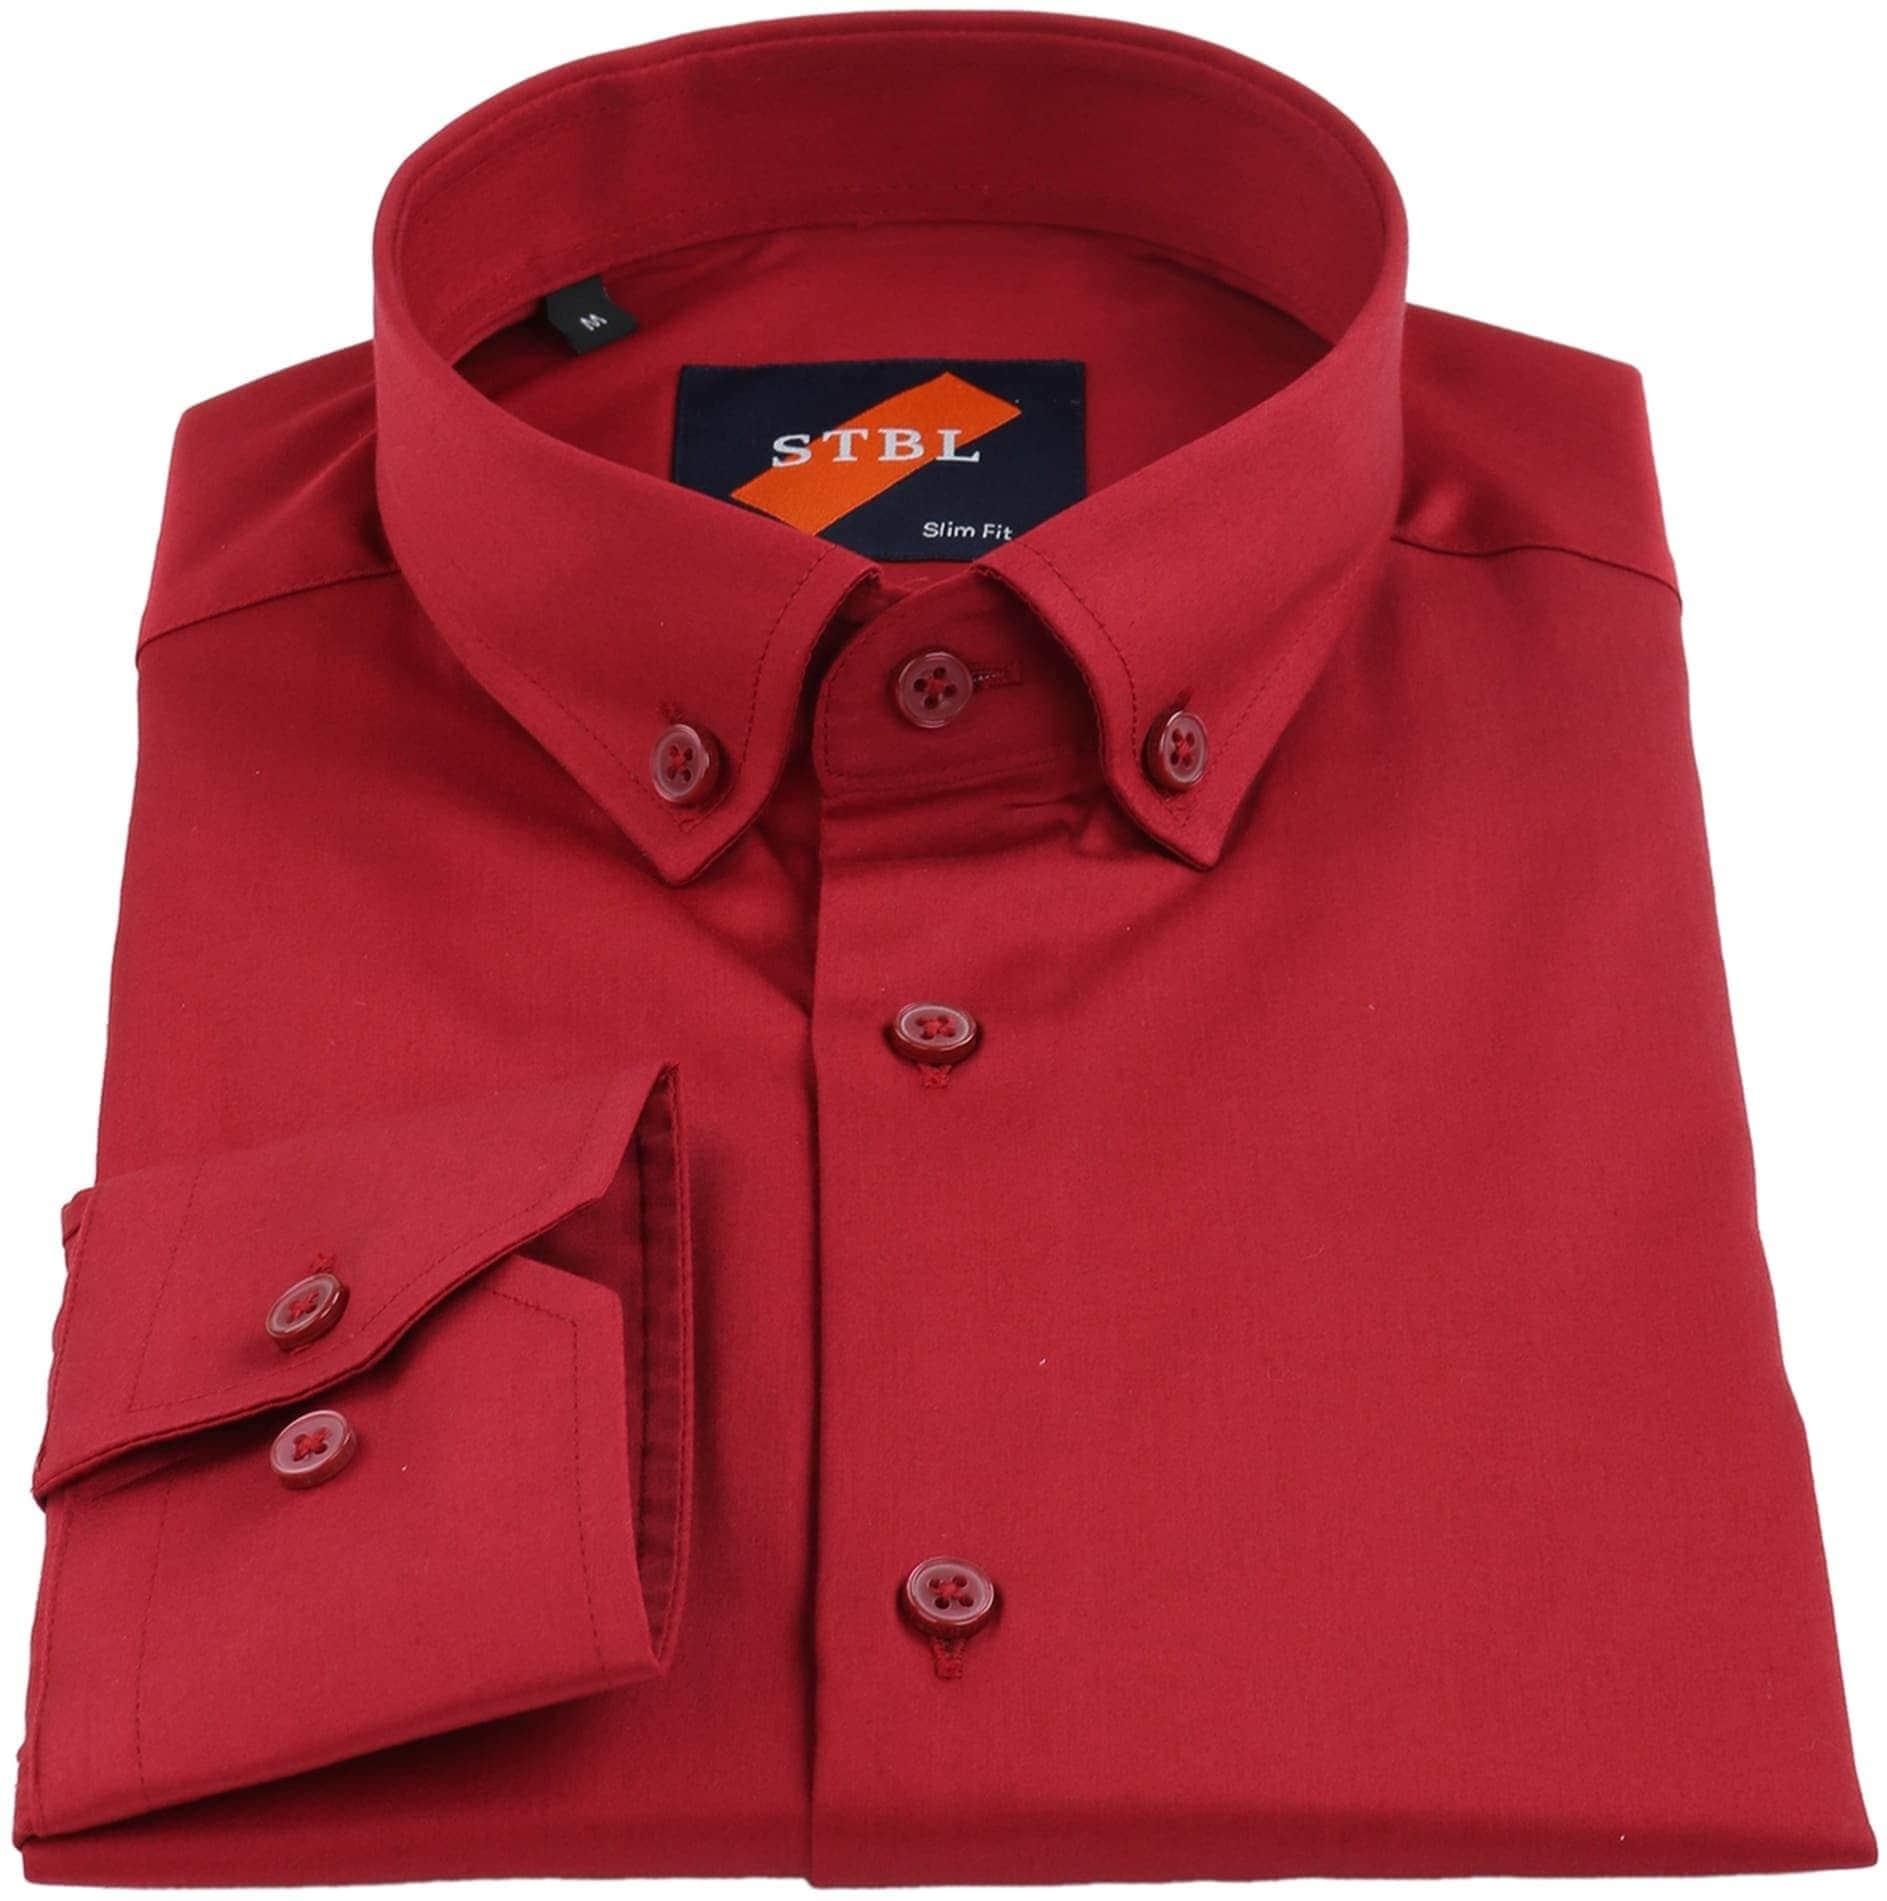 Suitable Hemd Uni Rot foto 1